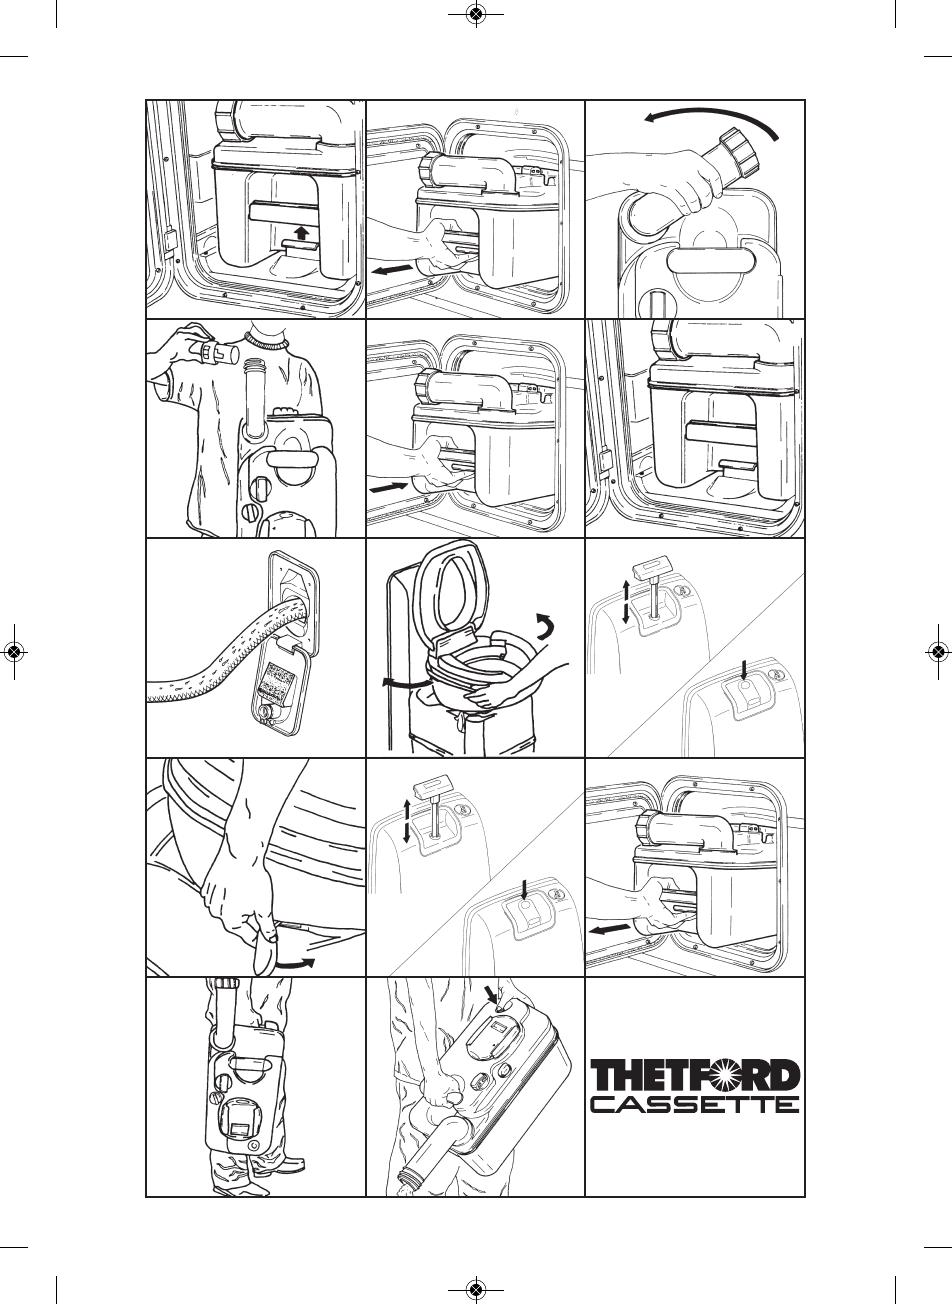 handleiding thetford c200 pagina 2 van 36 dansk. Black Bedroom Furniture Sets. Home Design Ideas